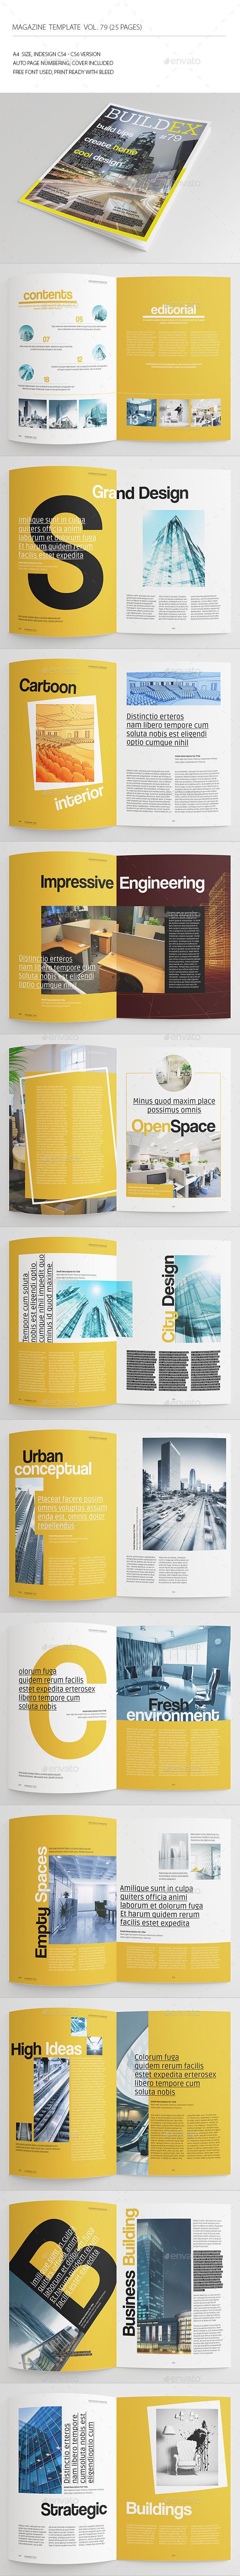 25 Pages Architect Magazine Vol79 - Magazines Print Templates